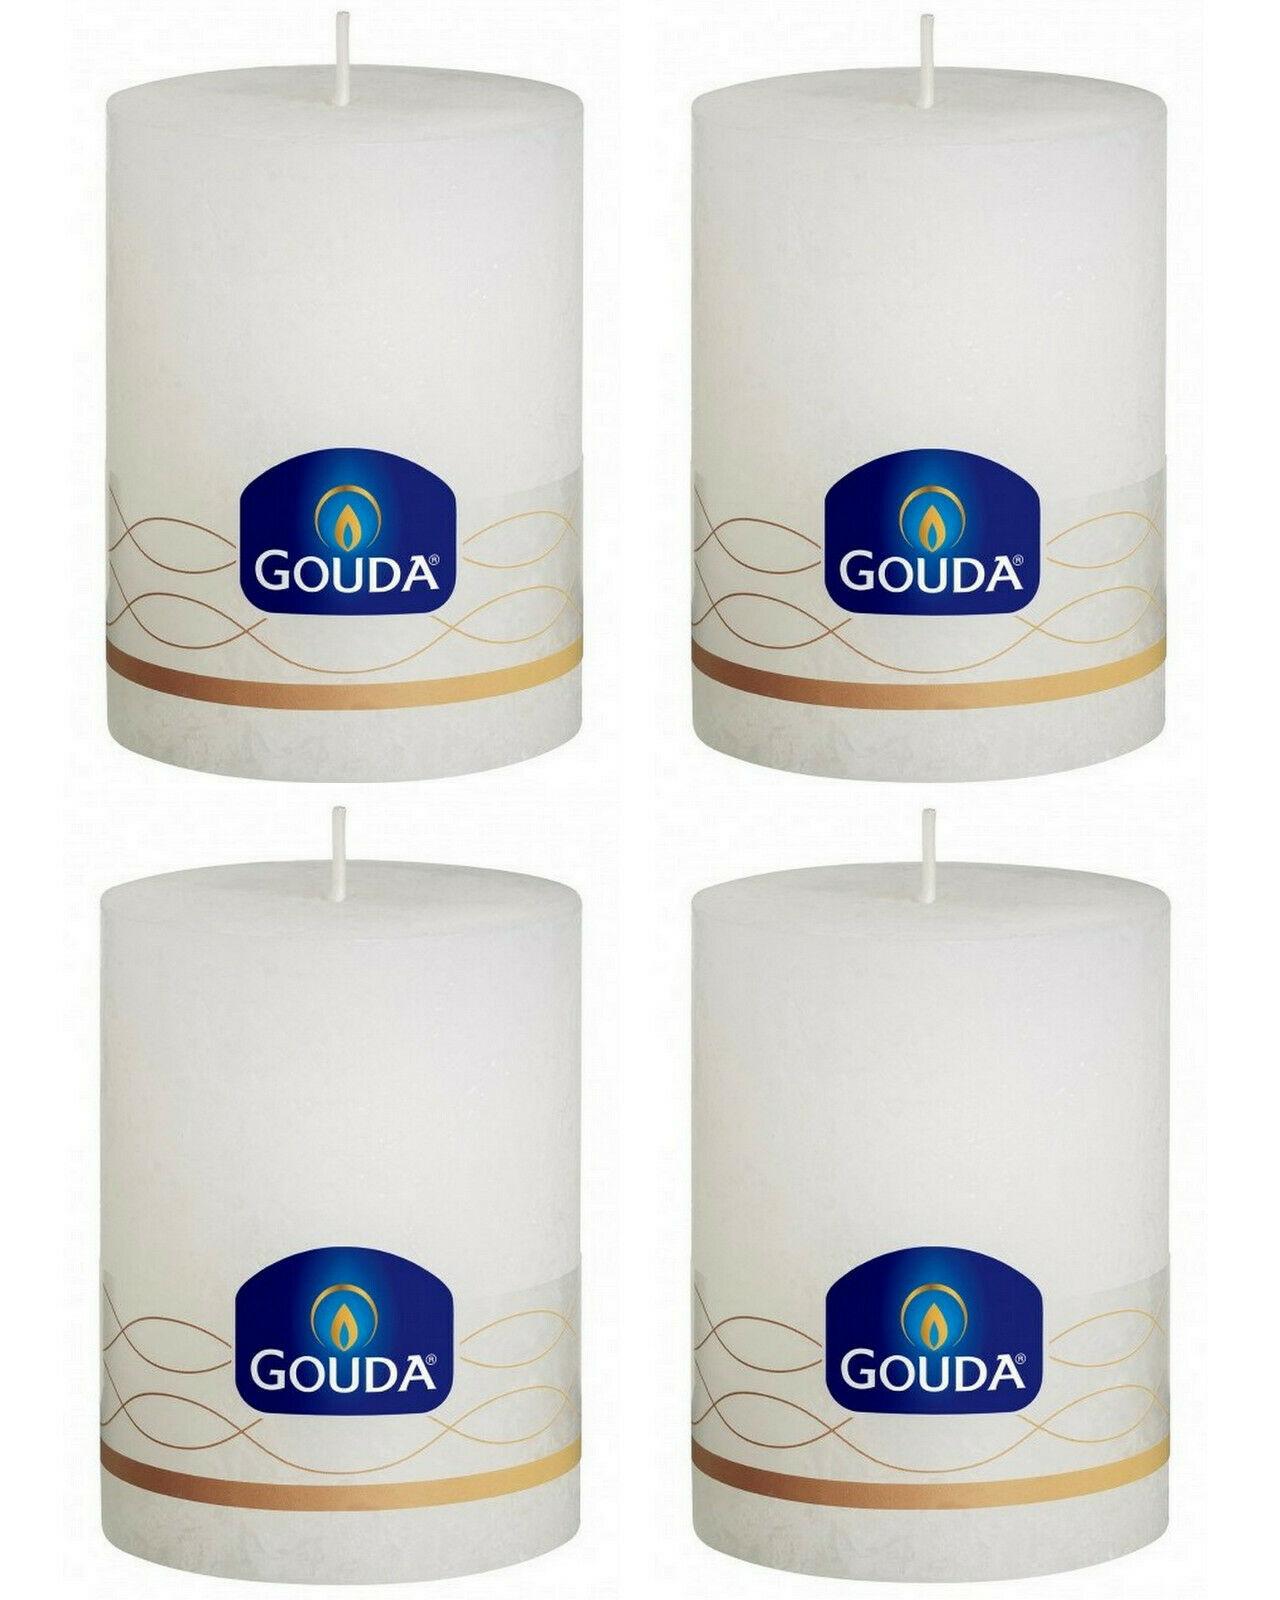 4 Stück Gouda Rustic Stumpenkerze 100x75 mm durchgefärbte rustikale Kerzen   - Weiß